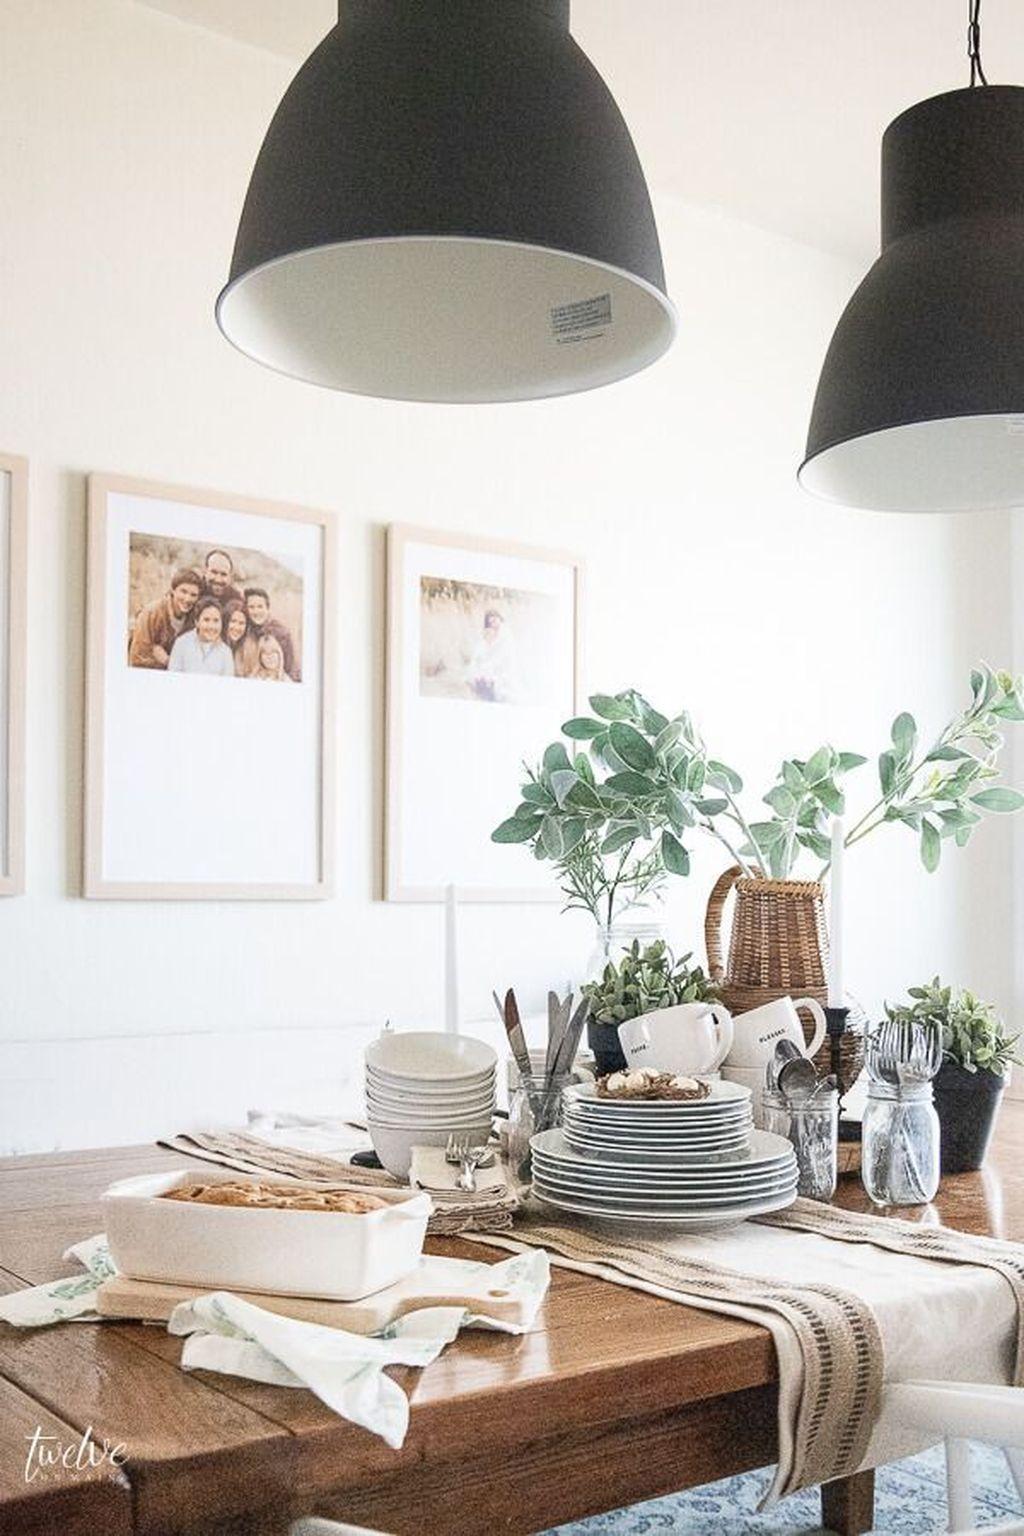 The Best Farmhouse Style Spring Tablescape Decor Ideas 05